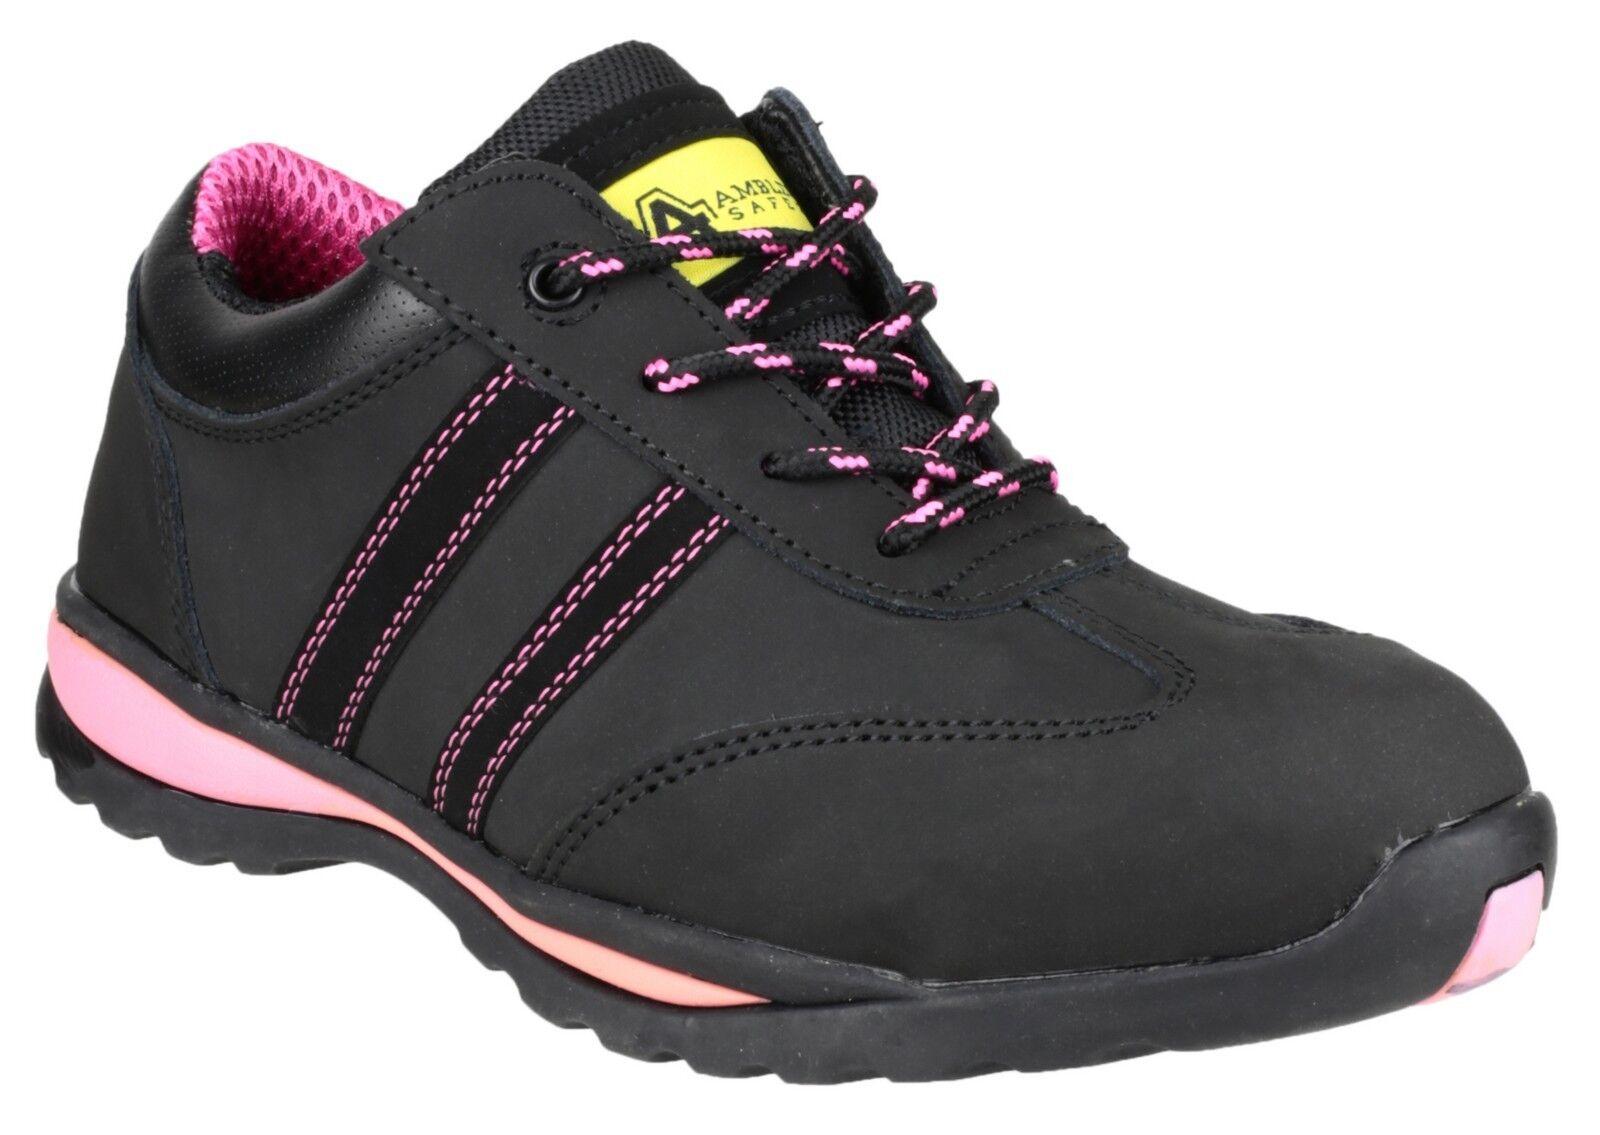 Amblers Safety femmes en cuir noir Sneaker Divers Divers Sneaker Taille FS47 d2ee56